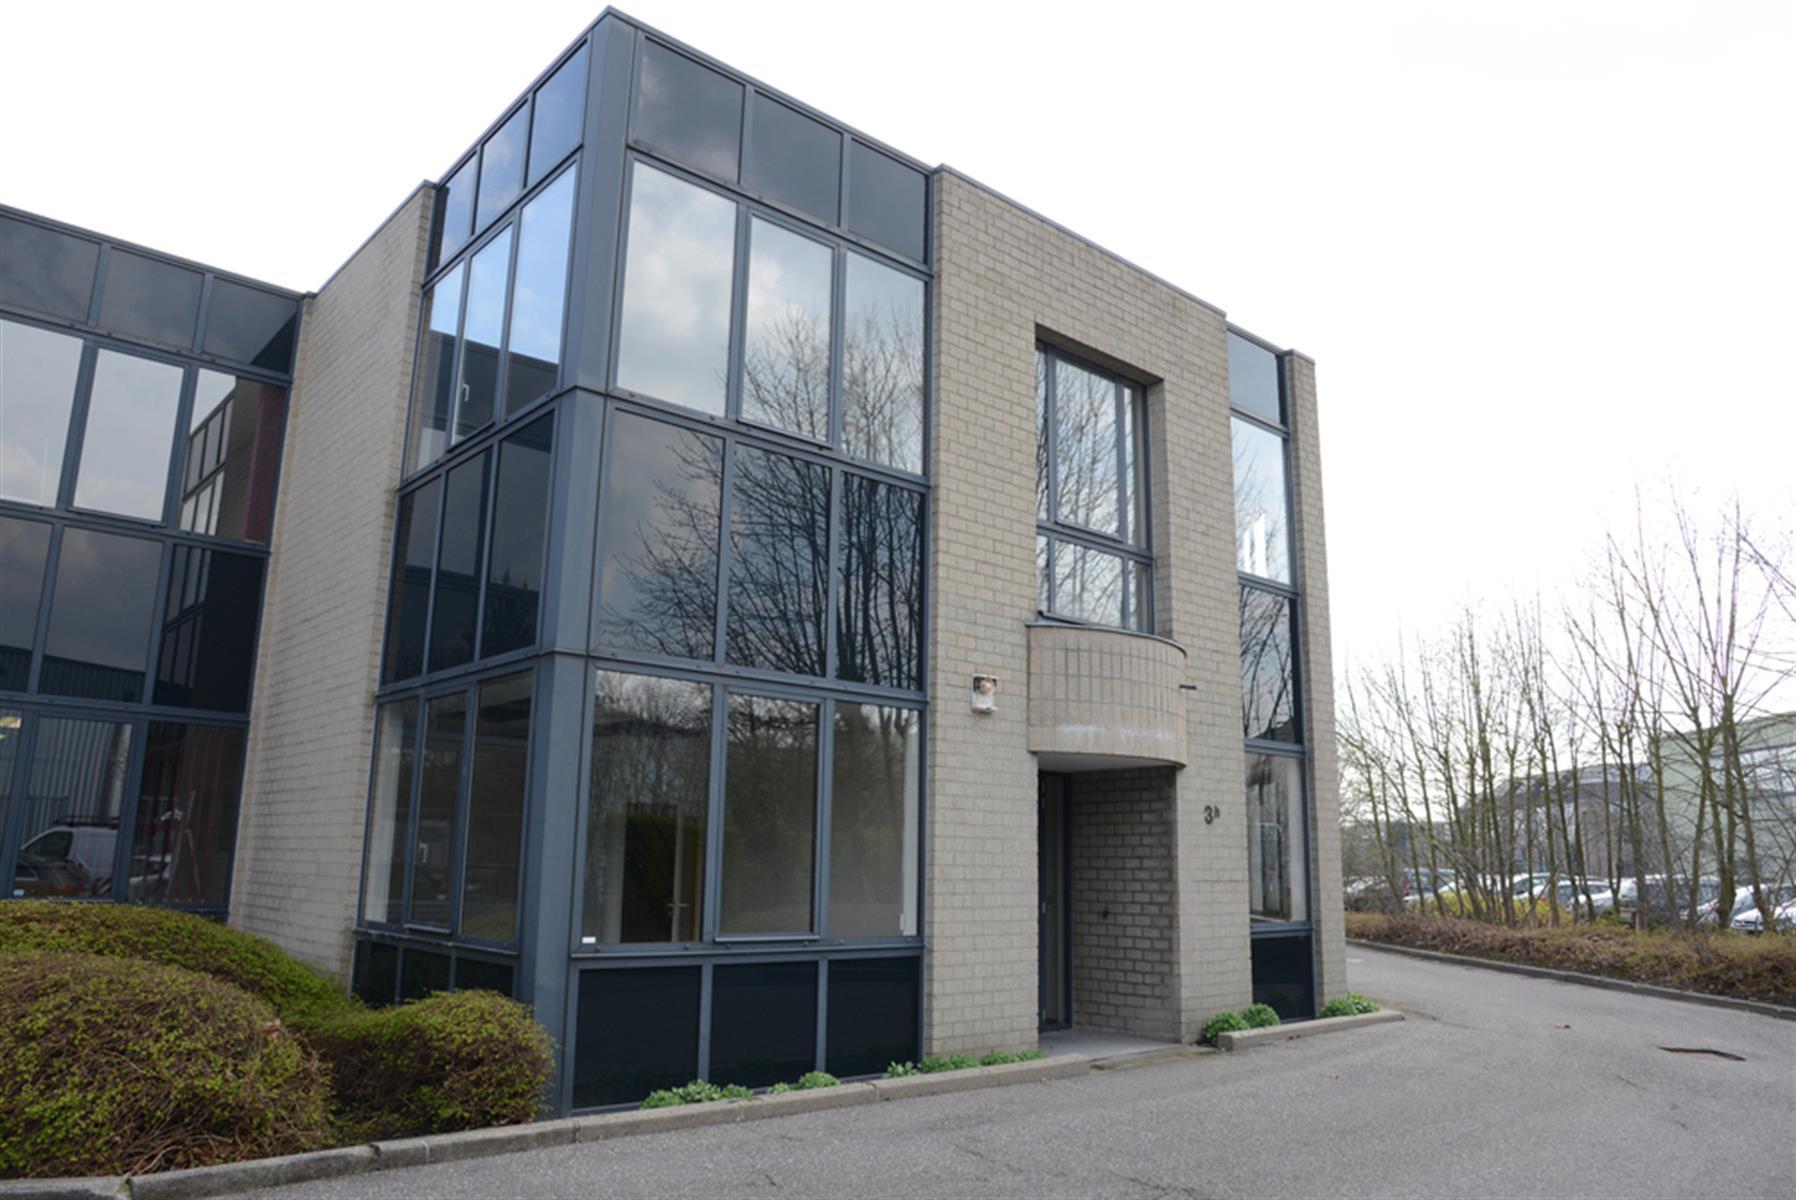 gebouw voor gemengd gebruik te huur UNIT H : MAGAZIJN 547m² MET KANTOOR 288m² - Ingberthoeveweg 3, 2630 Aartselaar, België 2